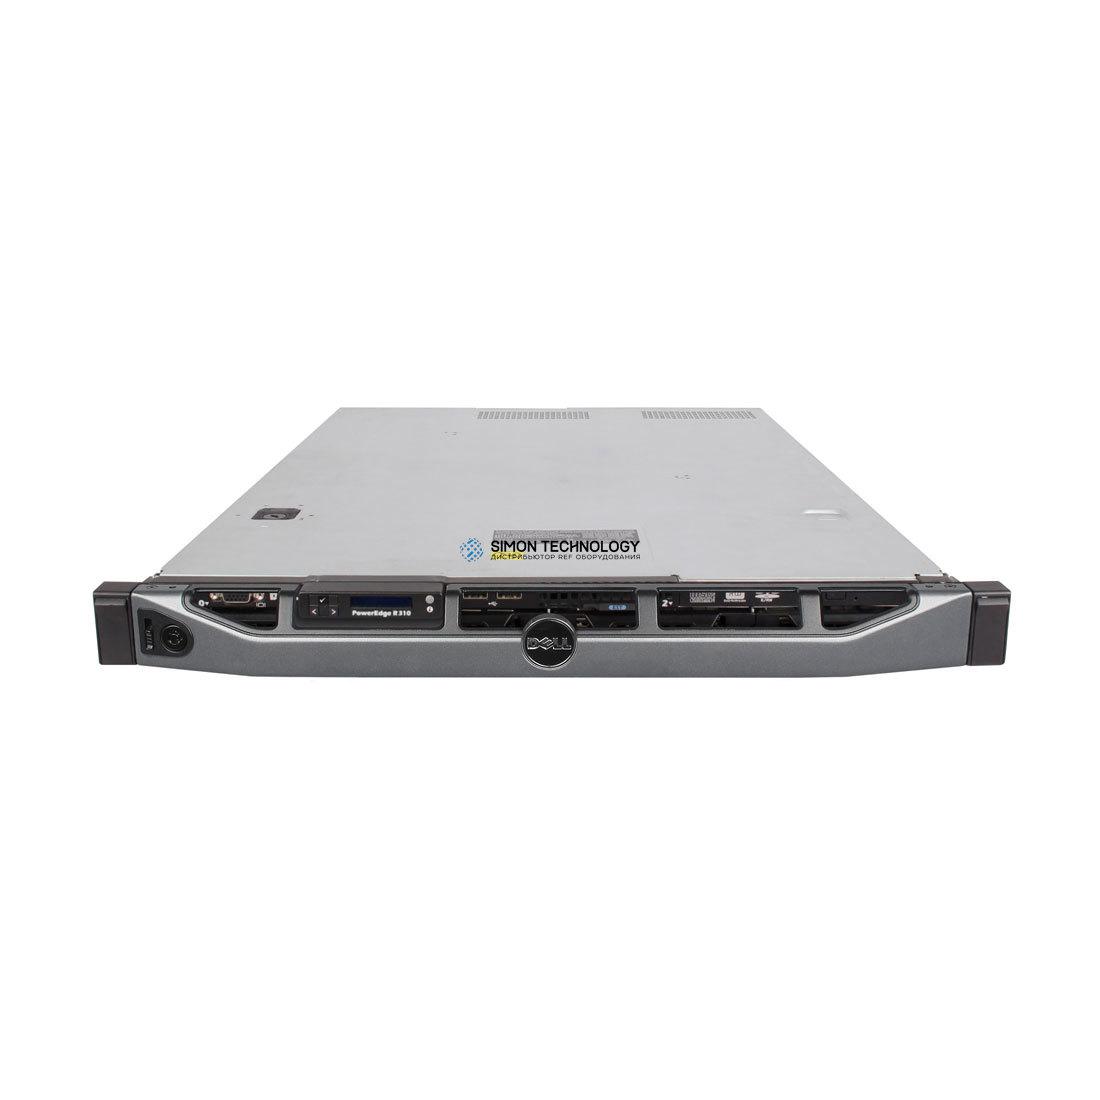 Сервер Dell PER310 1*X3450 4GB PERC 6/I 4LFF NHP DVD (R310 X3450)